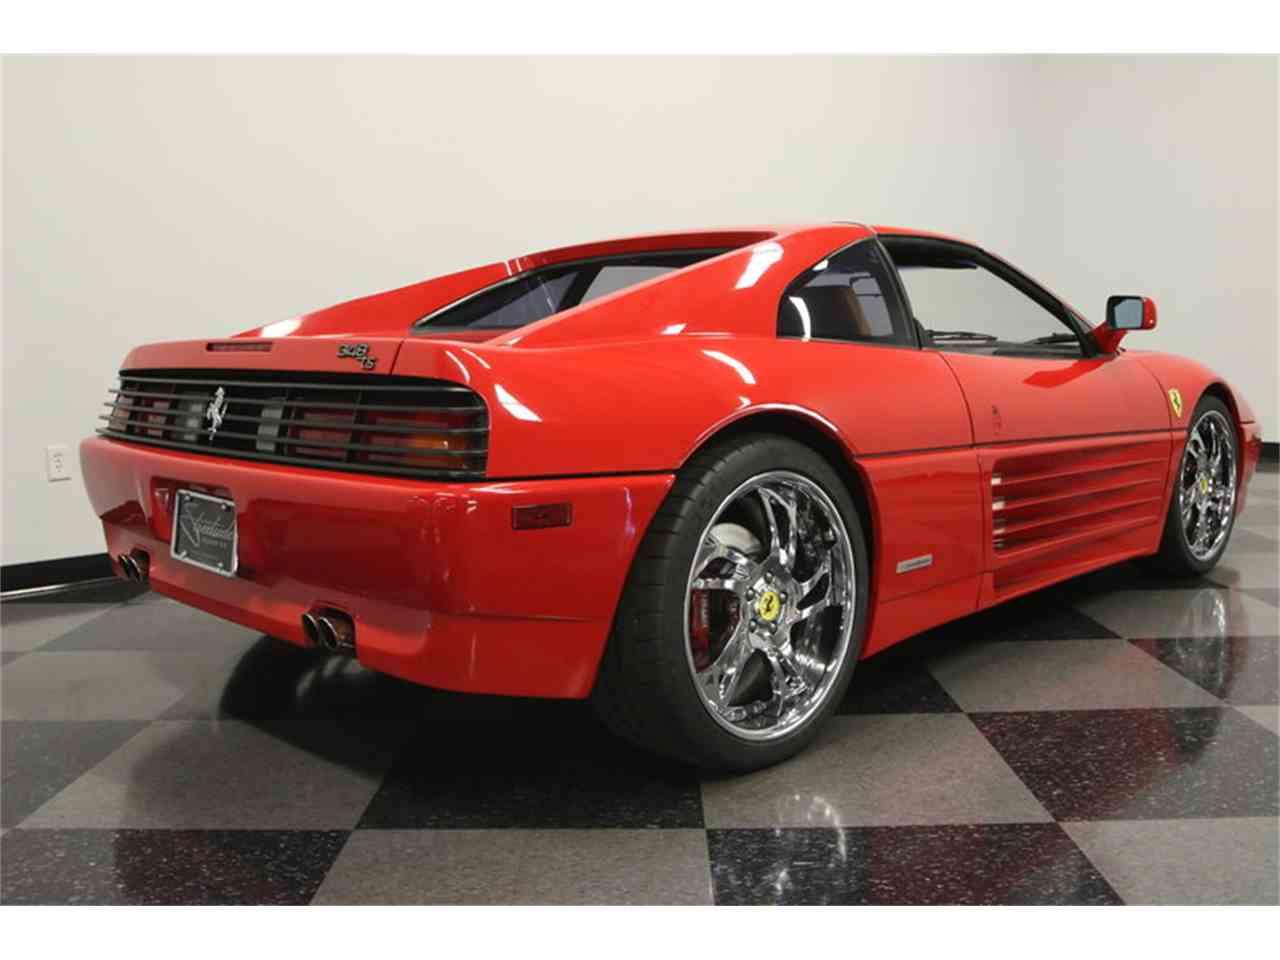 Gsa Auto Auction >> Public Auto Auctions In Florida Public Auto Auctions | Upcomingcarshq.com